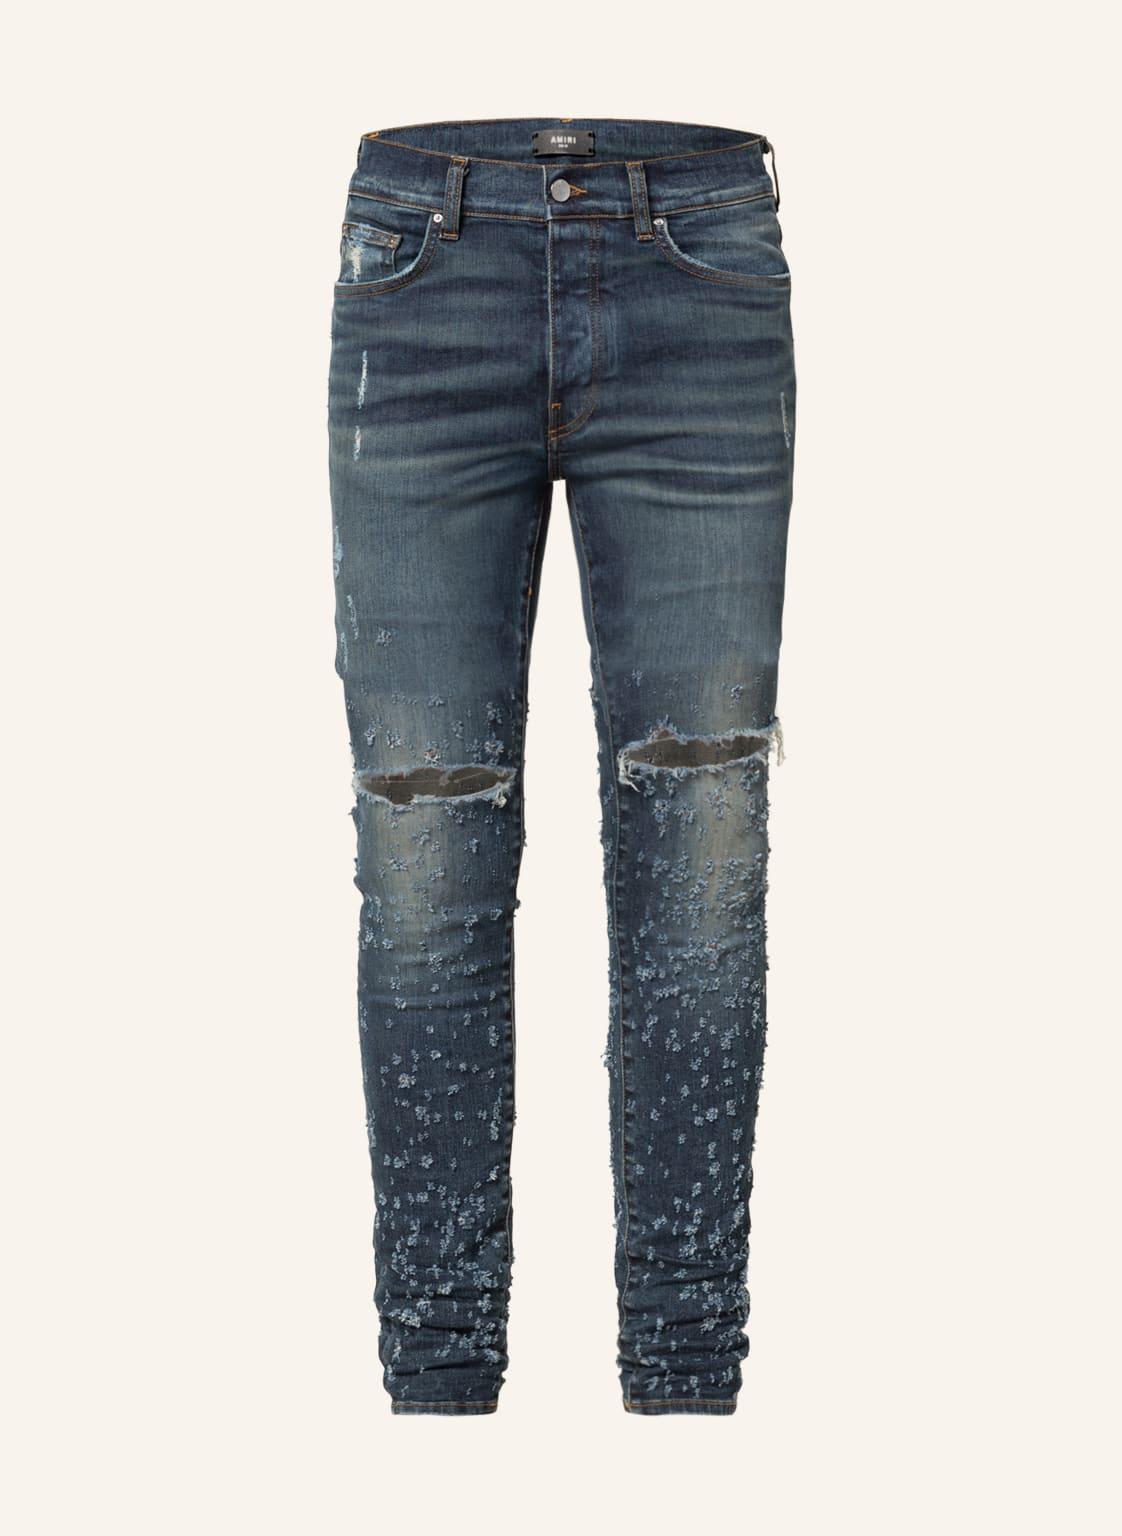 Image of Amiri Destroyed Jeans Shotgun Skinny Fit blau